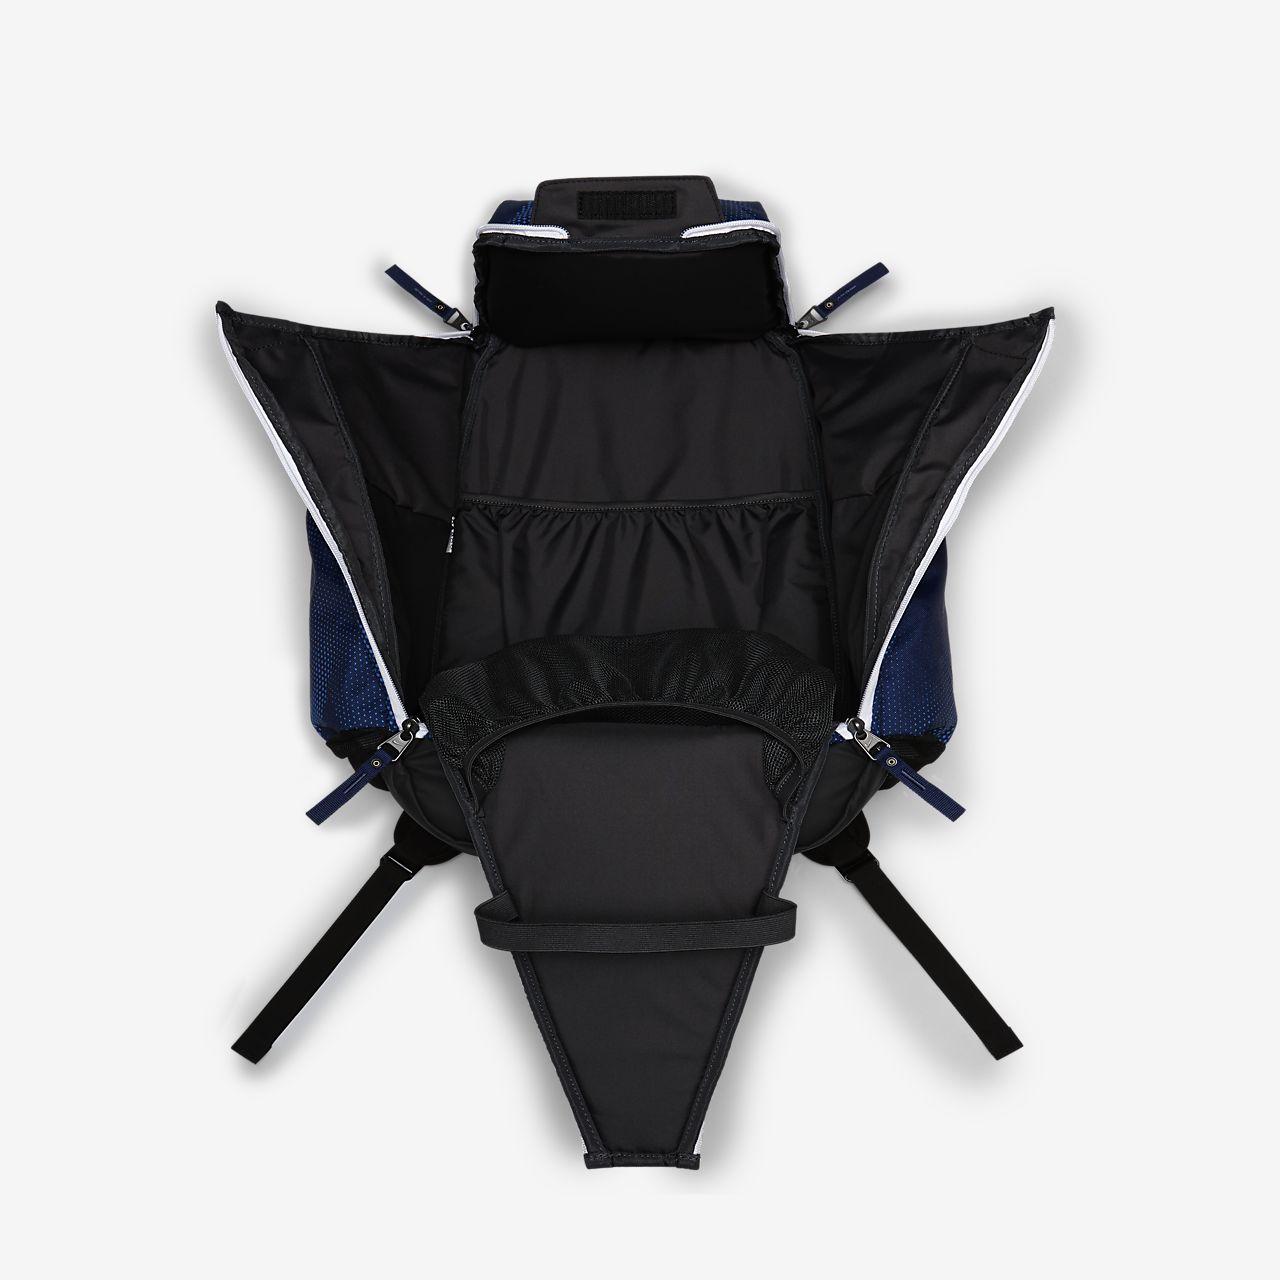 bfd1cf0ad22 Buy nike hoops elite max air team 2.0 backpack > up to 66% Discounts